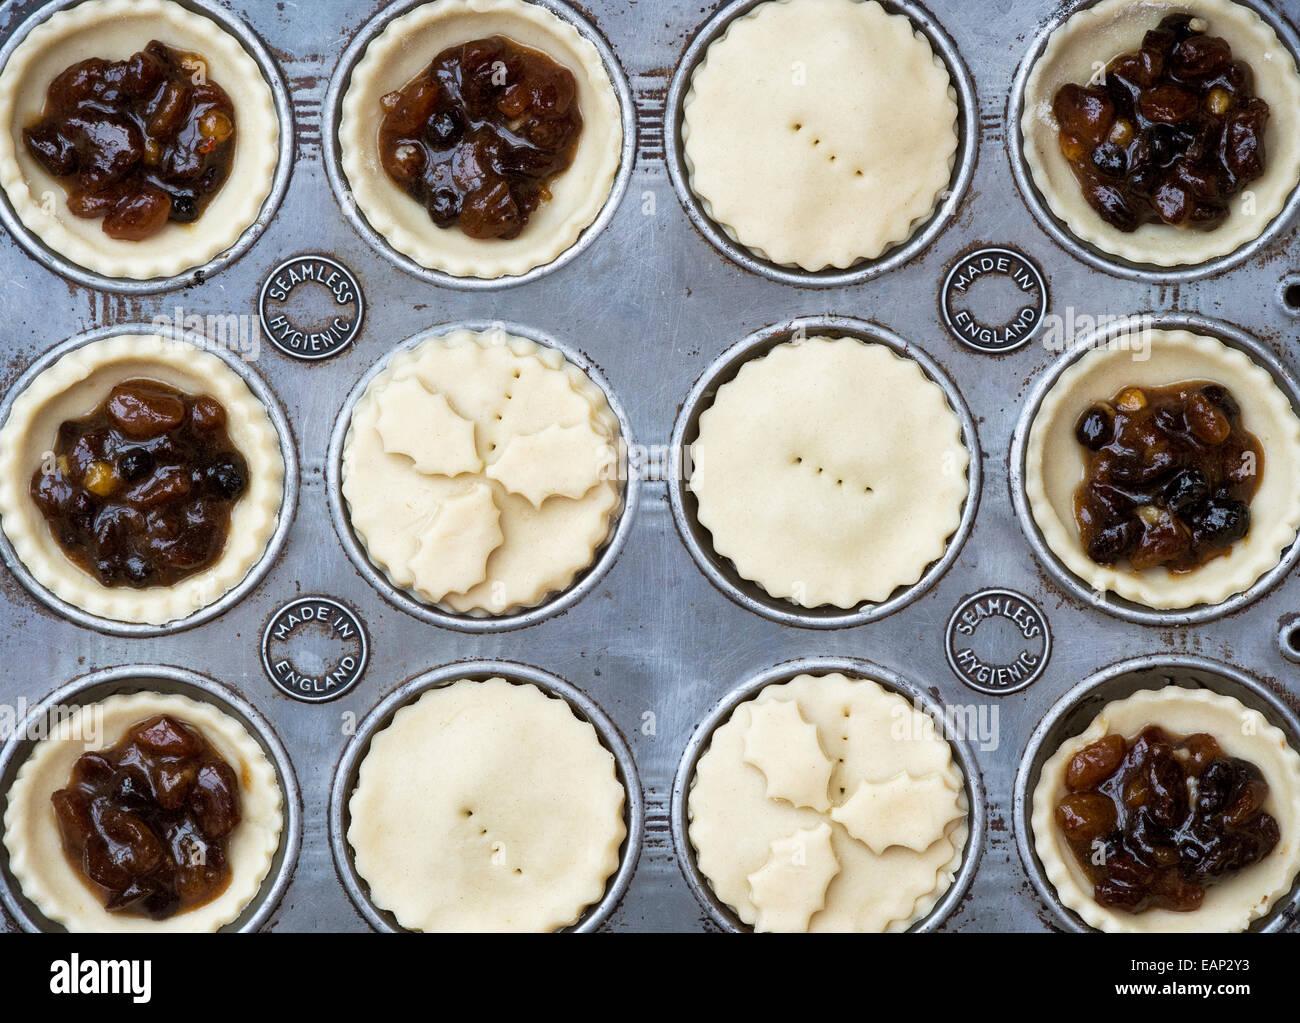 Baking Homemade Christmas mince pies - Stock Image